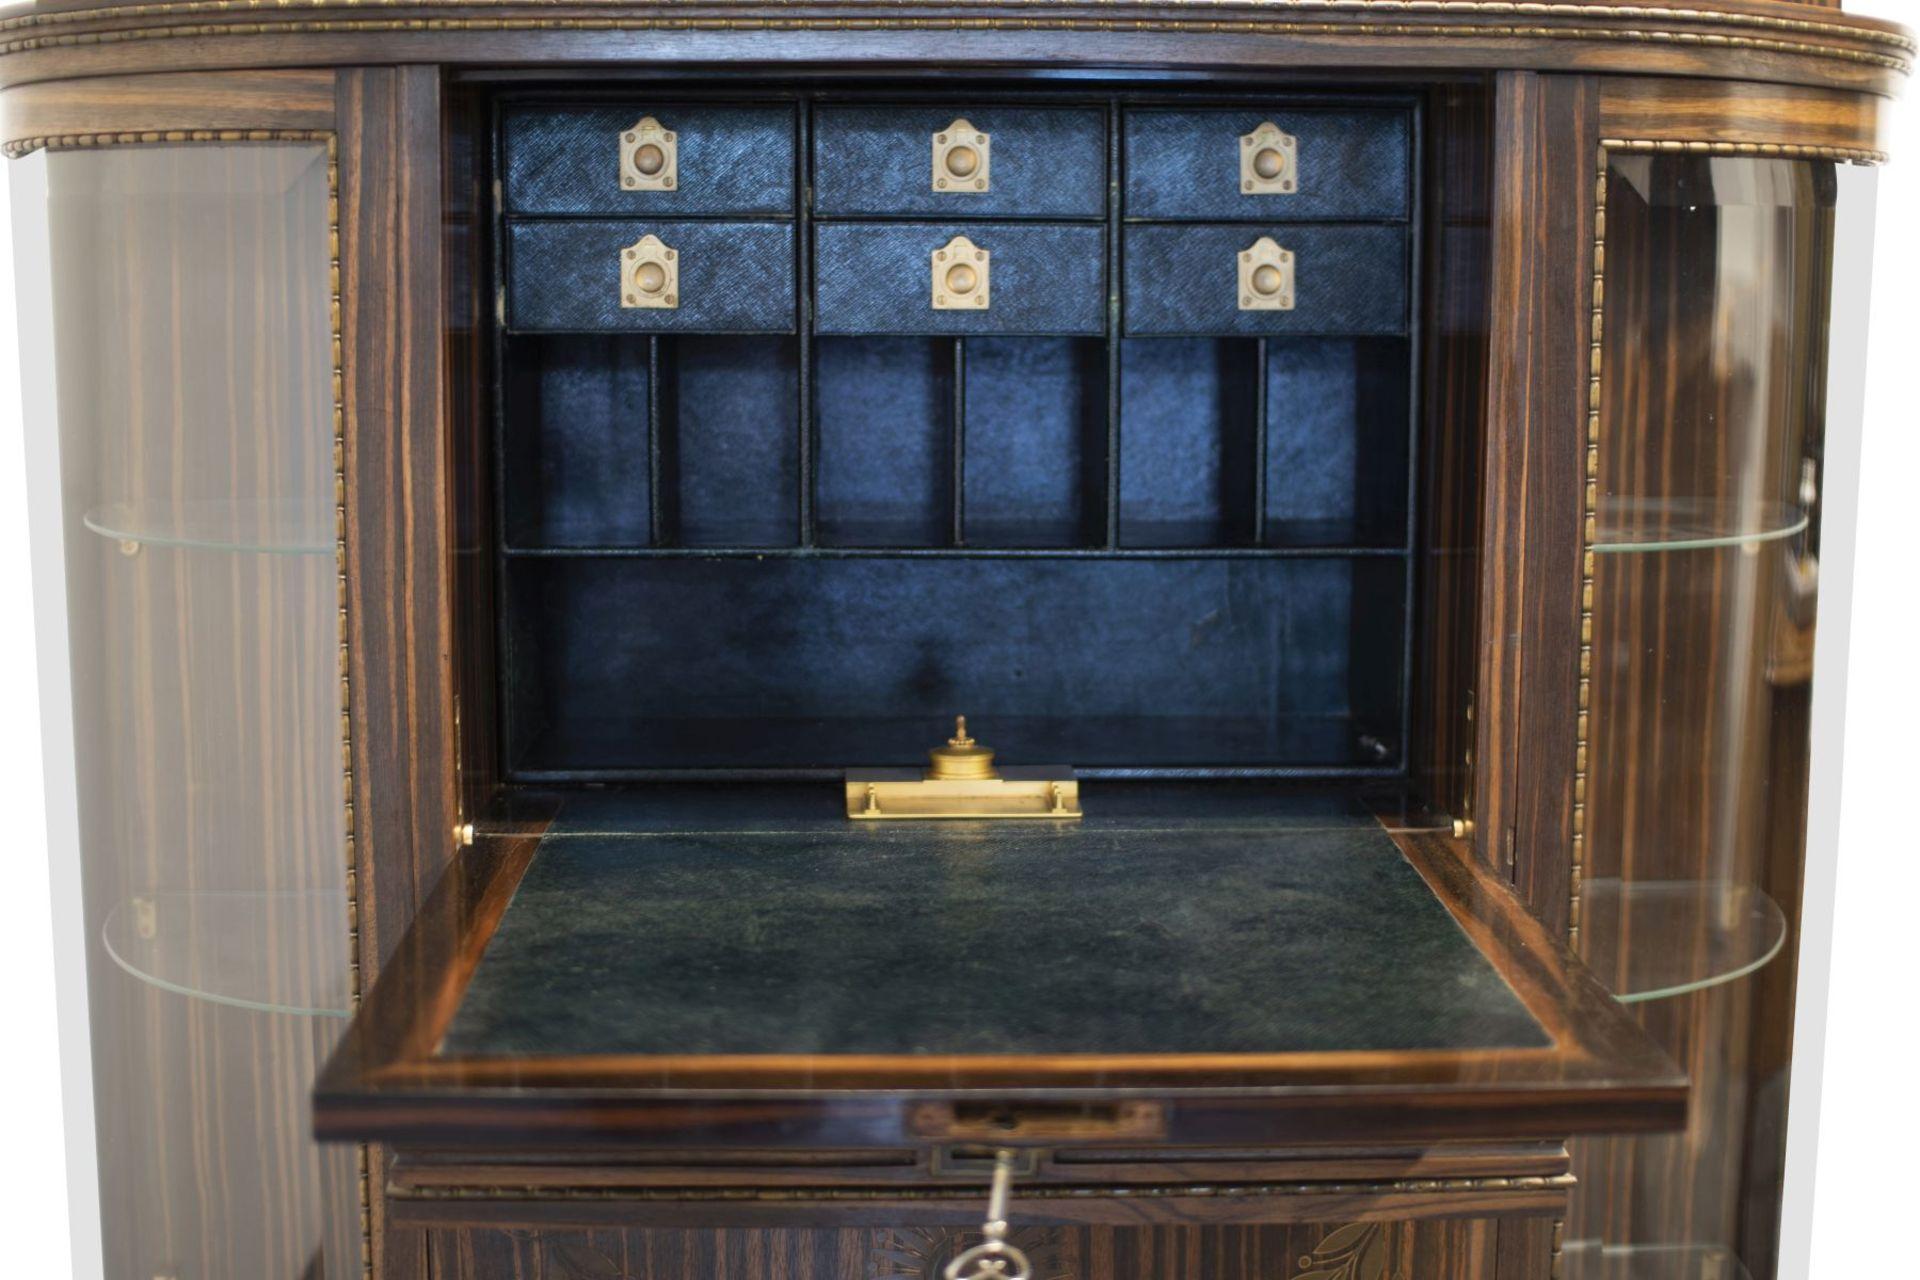 Antique englisch secretary - Image 4 of 5